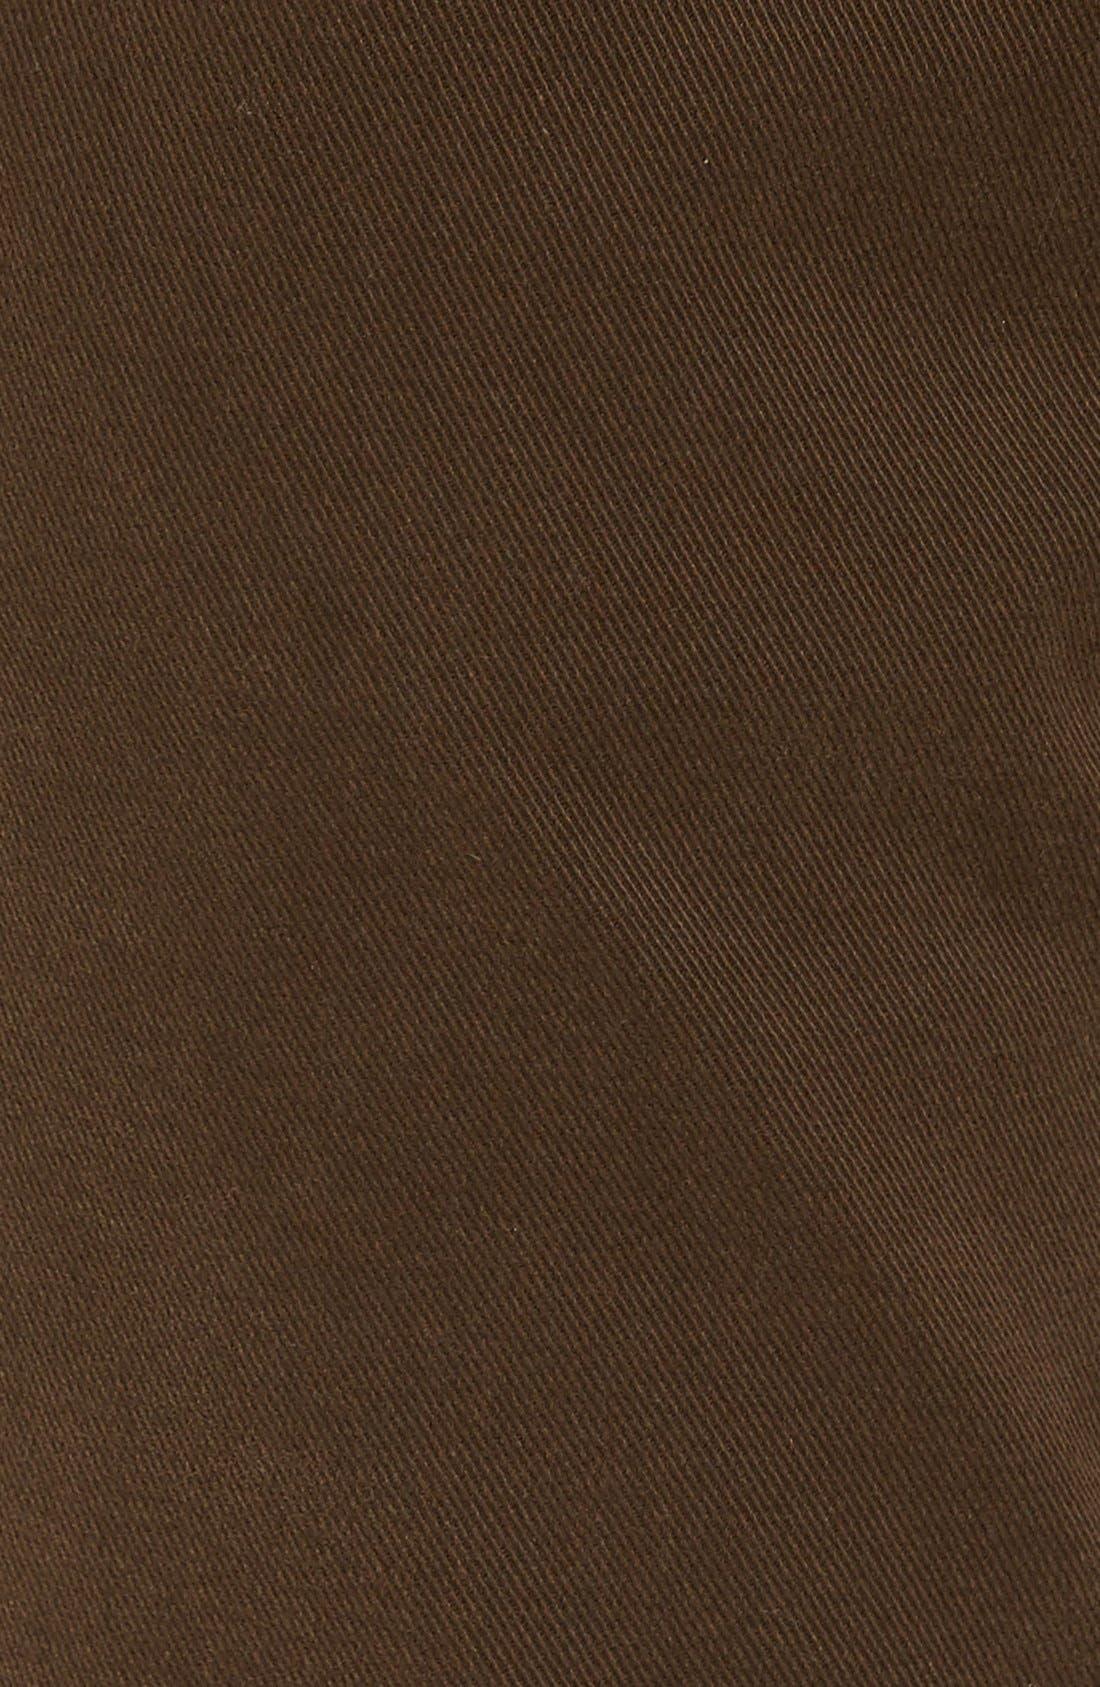 'Barters' Straight Leg Twill Pants,                             Alternate thumbnail 5, color,                             Dark Tobacco